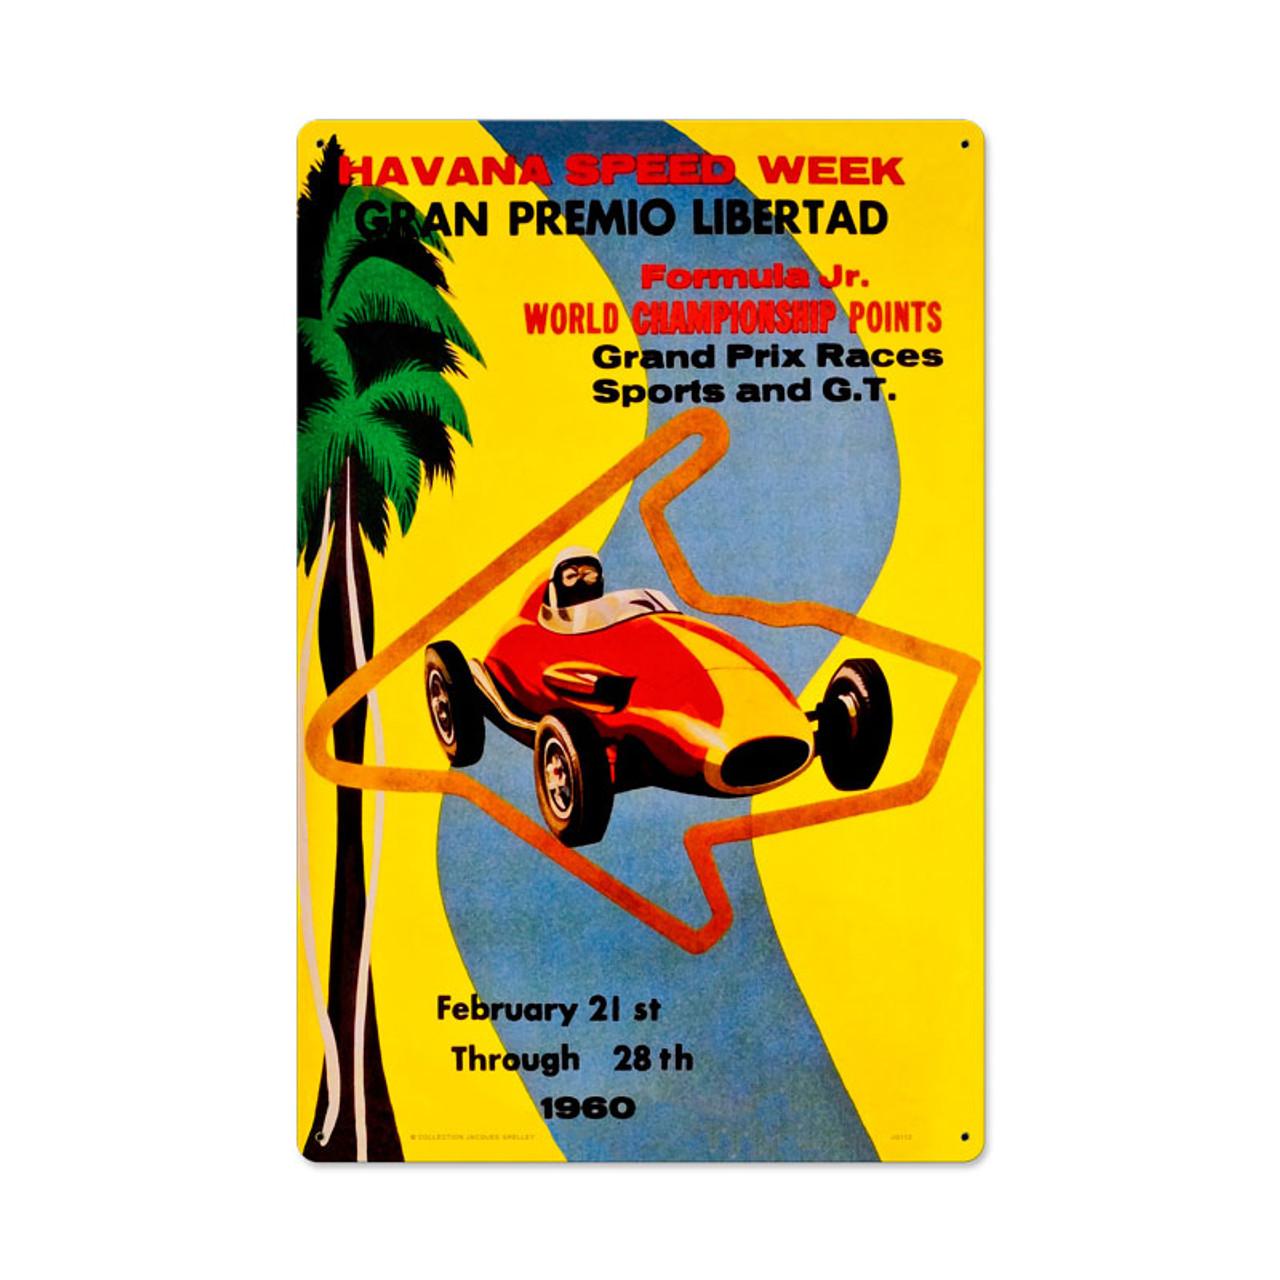 Havana Speed Week Metal Sign 16 x 24 Inches